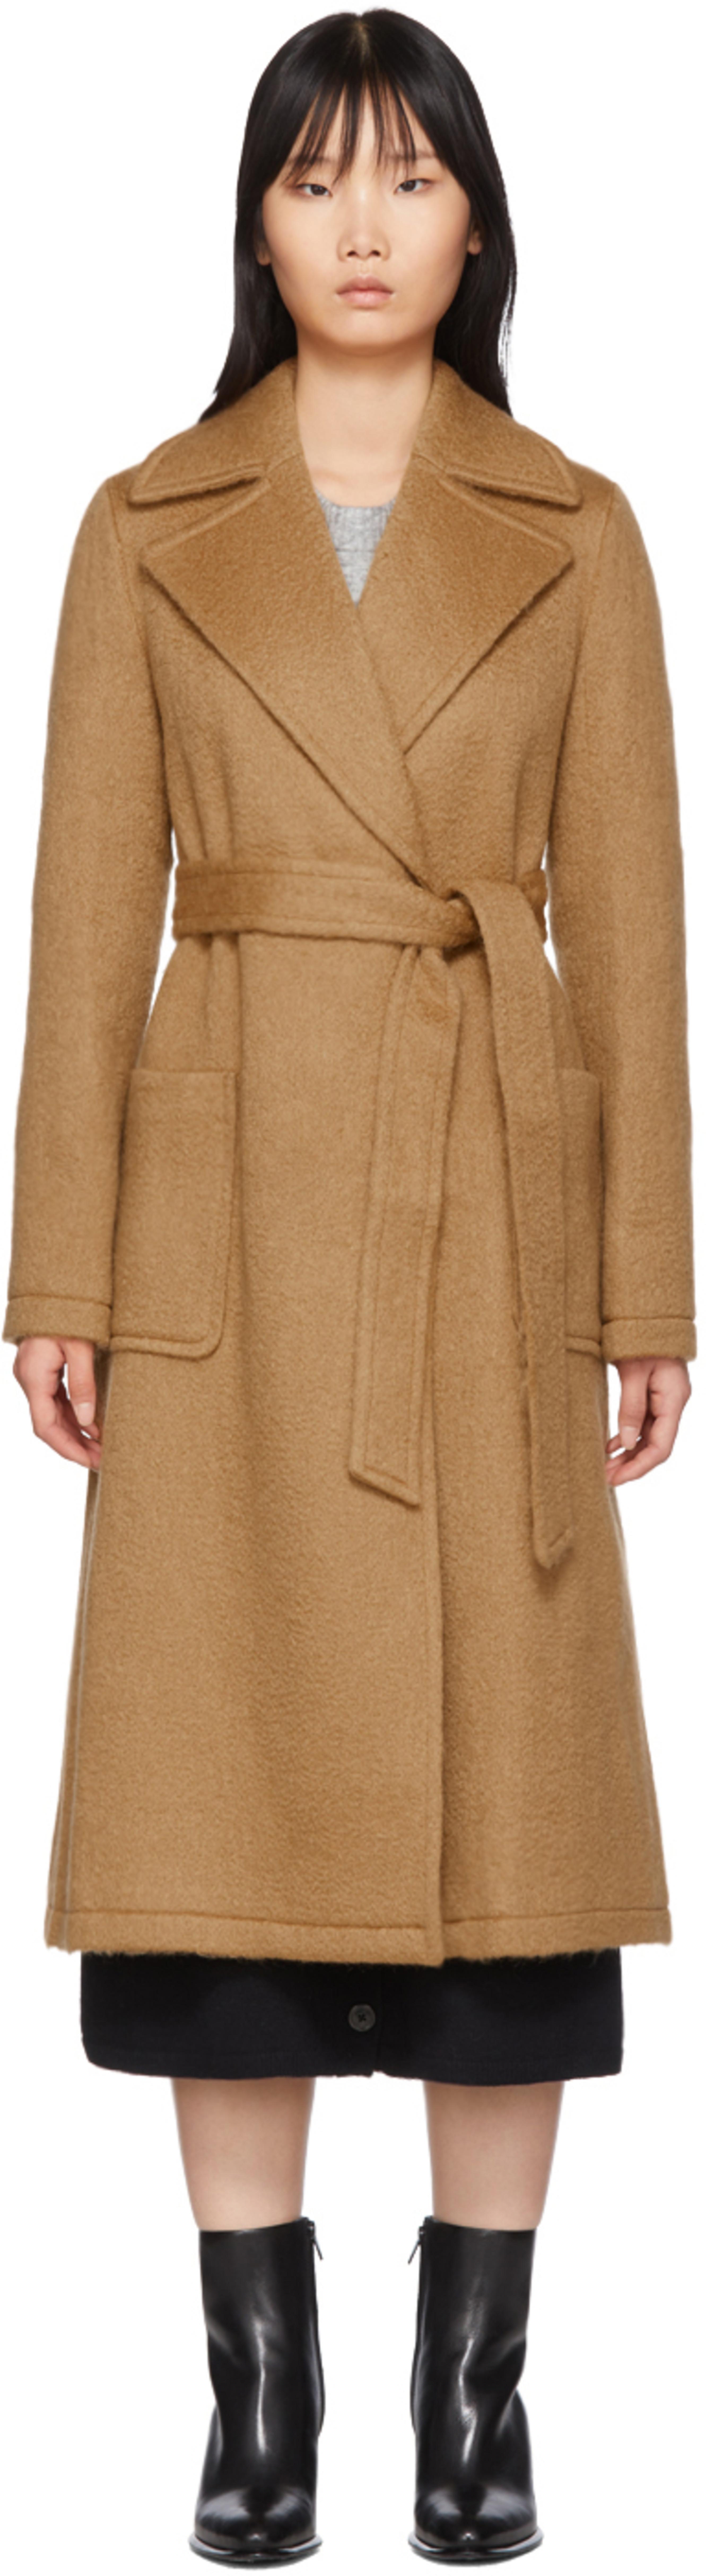 7fef243a Tan Mohair & Wool Woven Coat